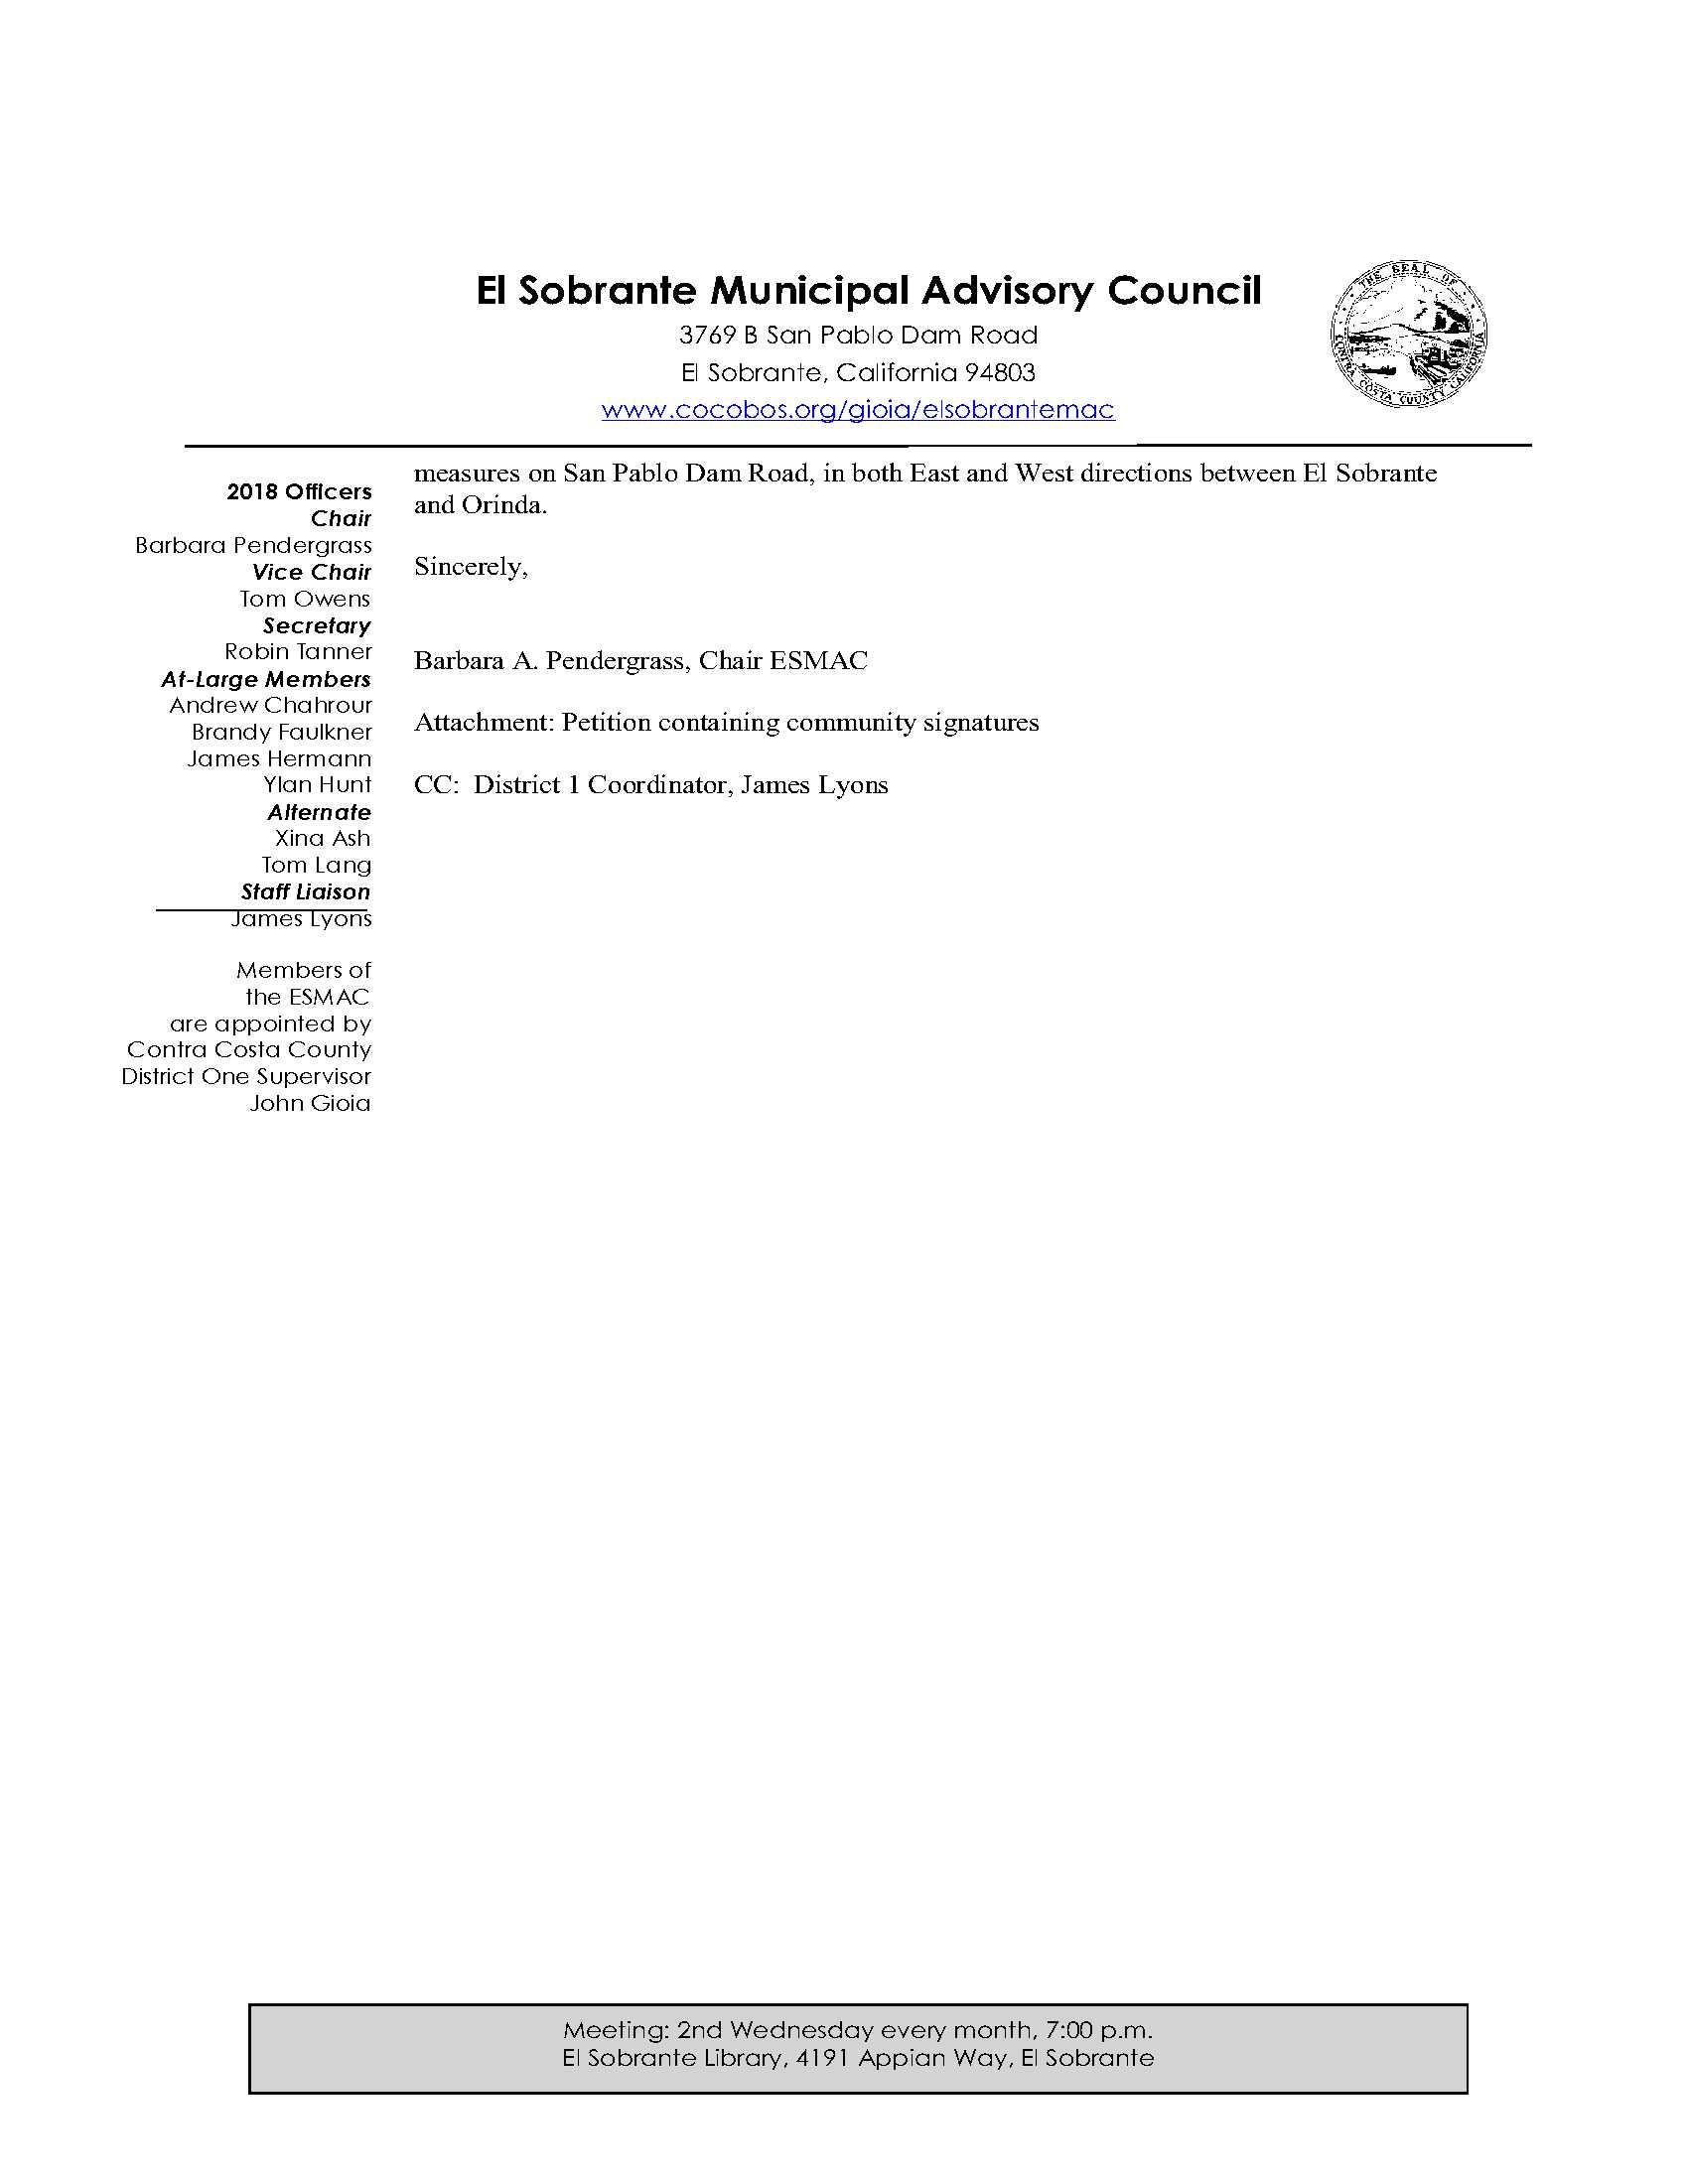 ESMAC Agenda 12.13.2018 (51 Pages)_21.jpg